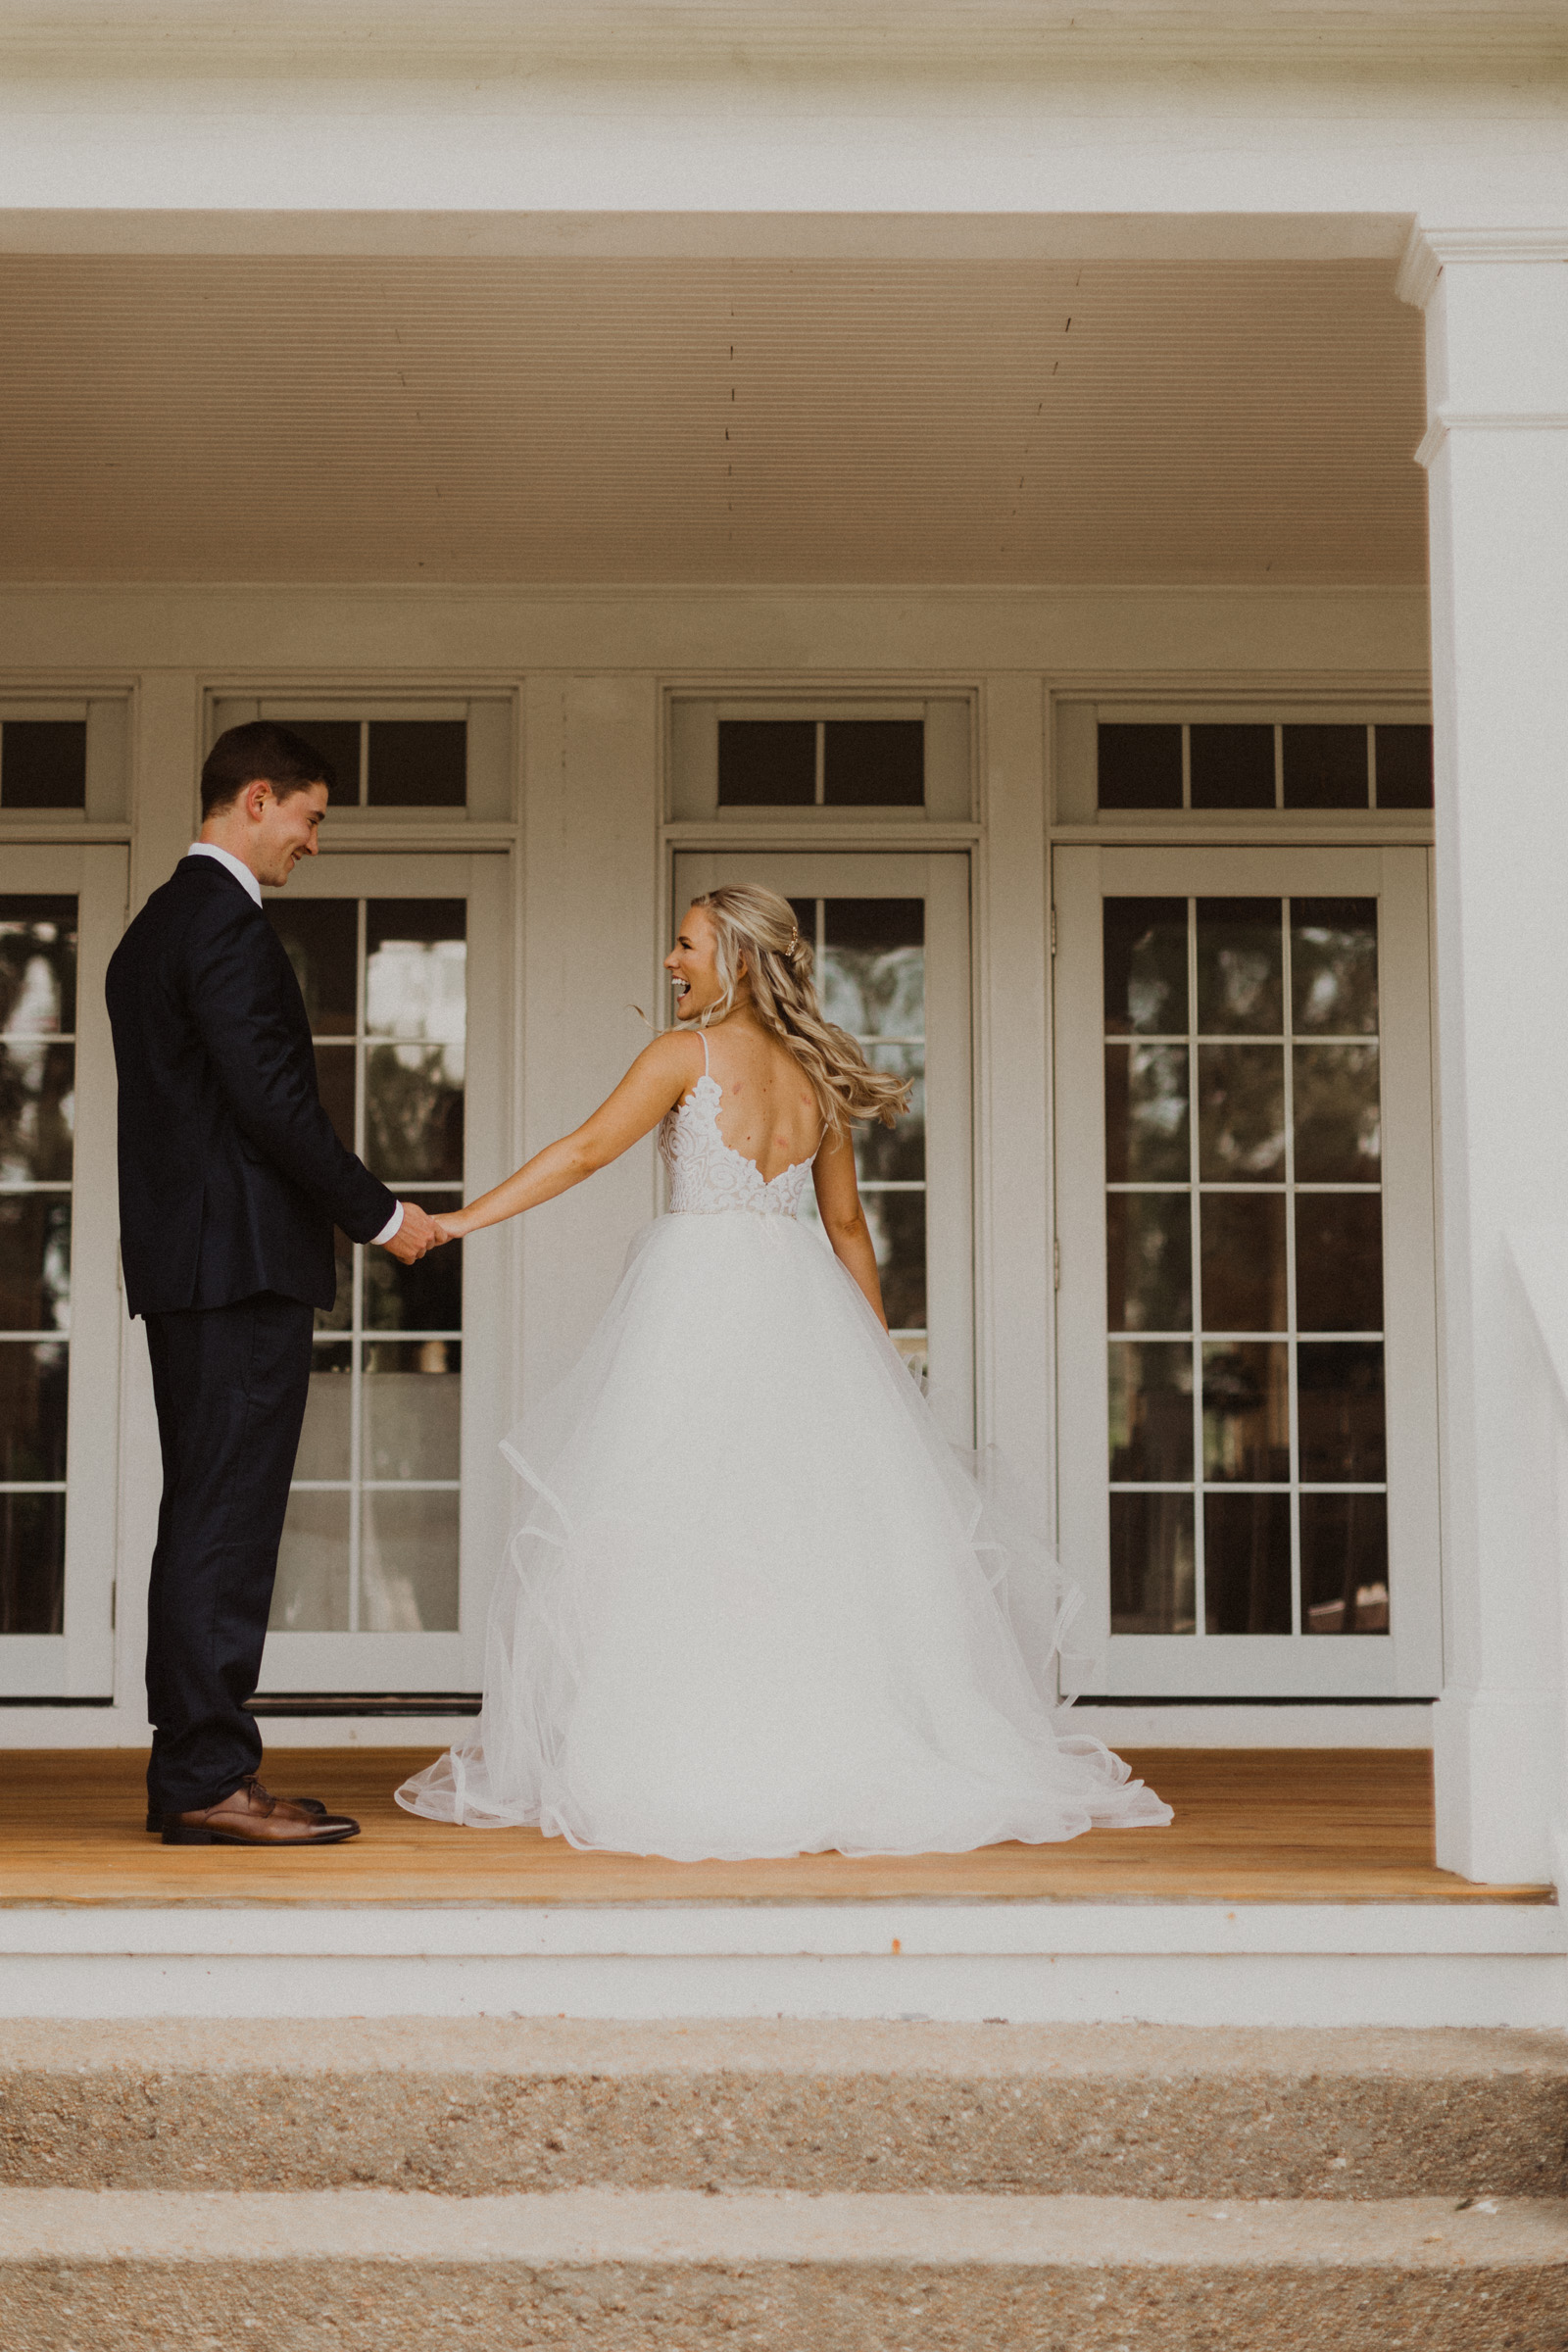 alyssa barletter photography hawthorne house summer outdoor wedding southern charm inspiration-20.jpg